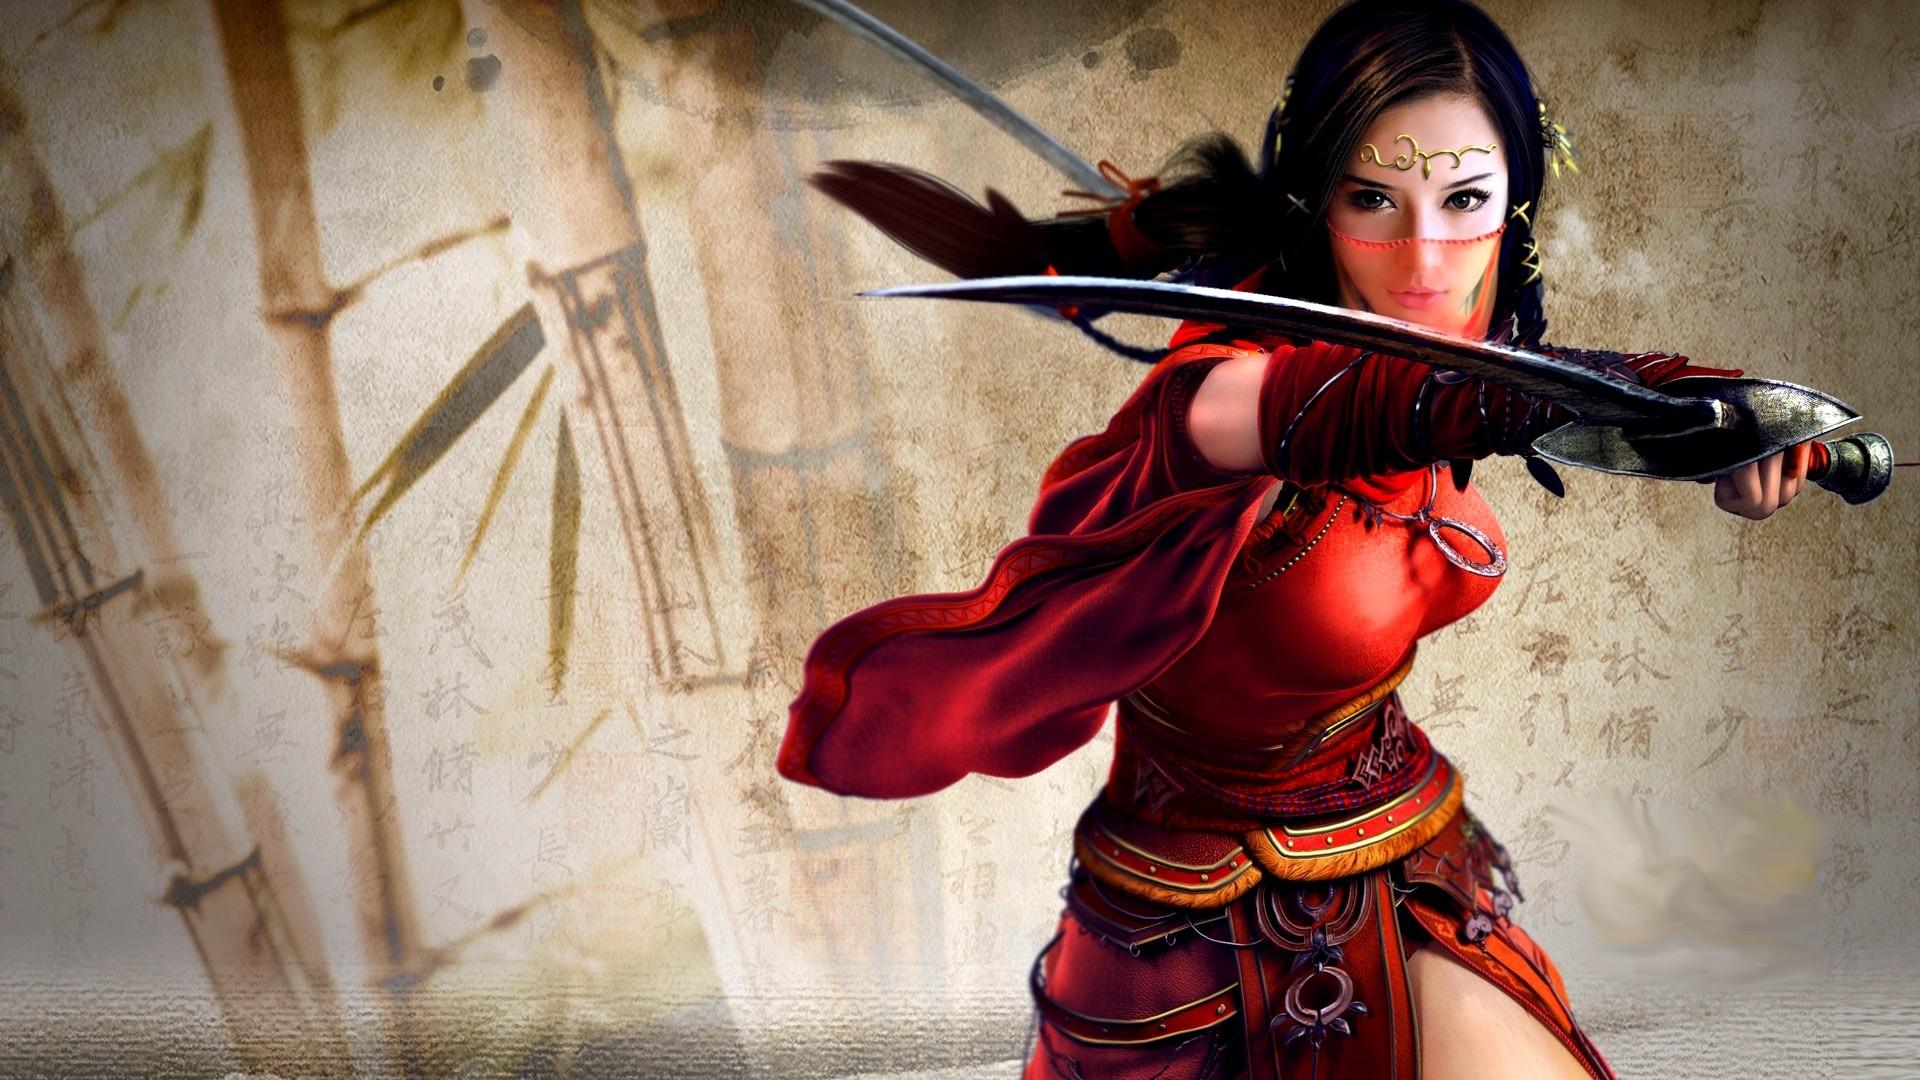 Wallpaper digital art women fantasy art fantasy girl - Girl with sword wallpaper ...